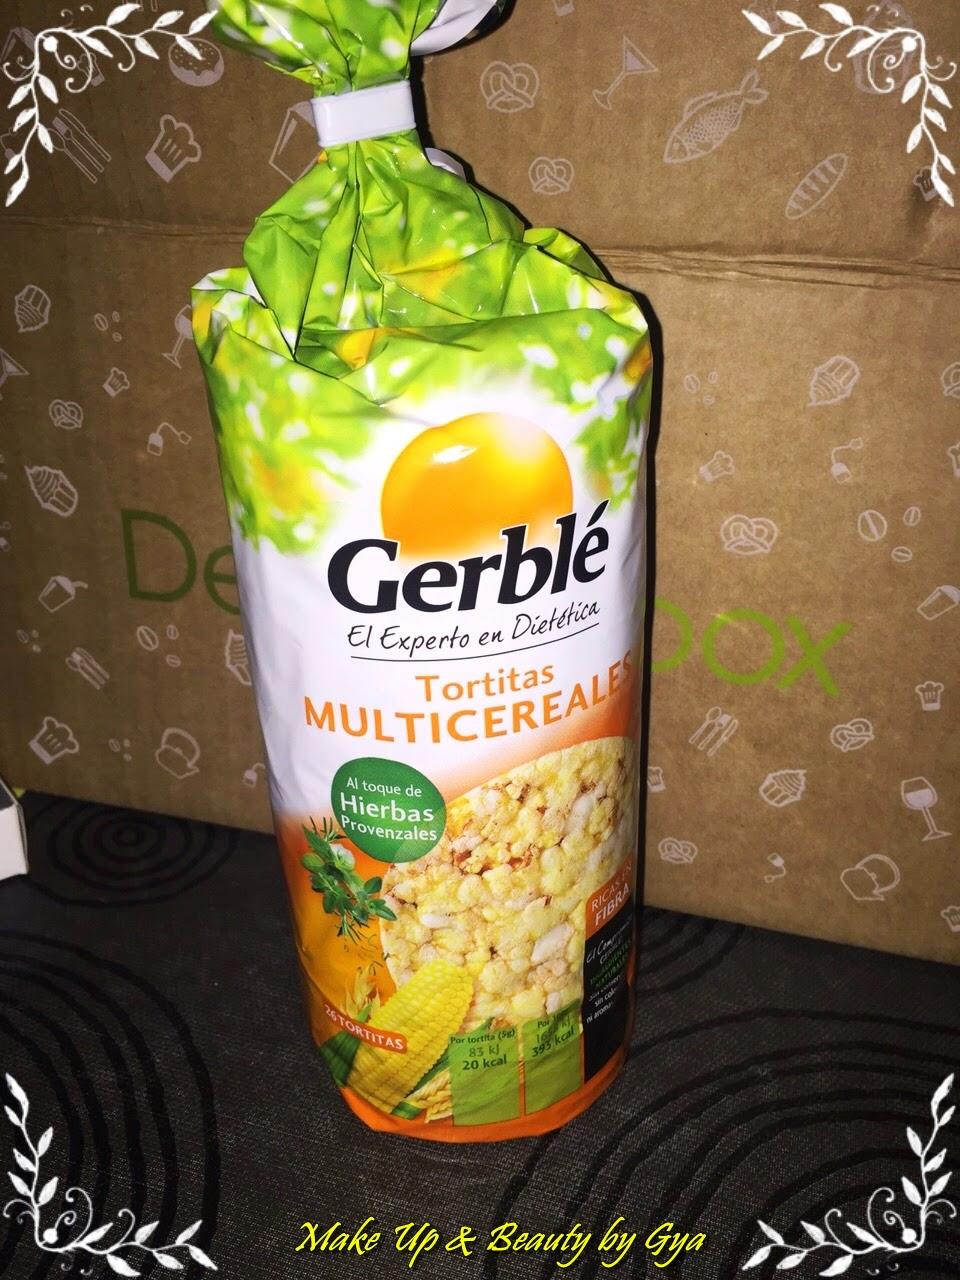 Gerblé degustabox marzo 2015